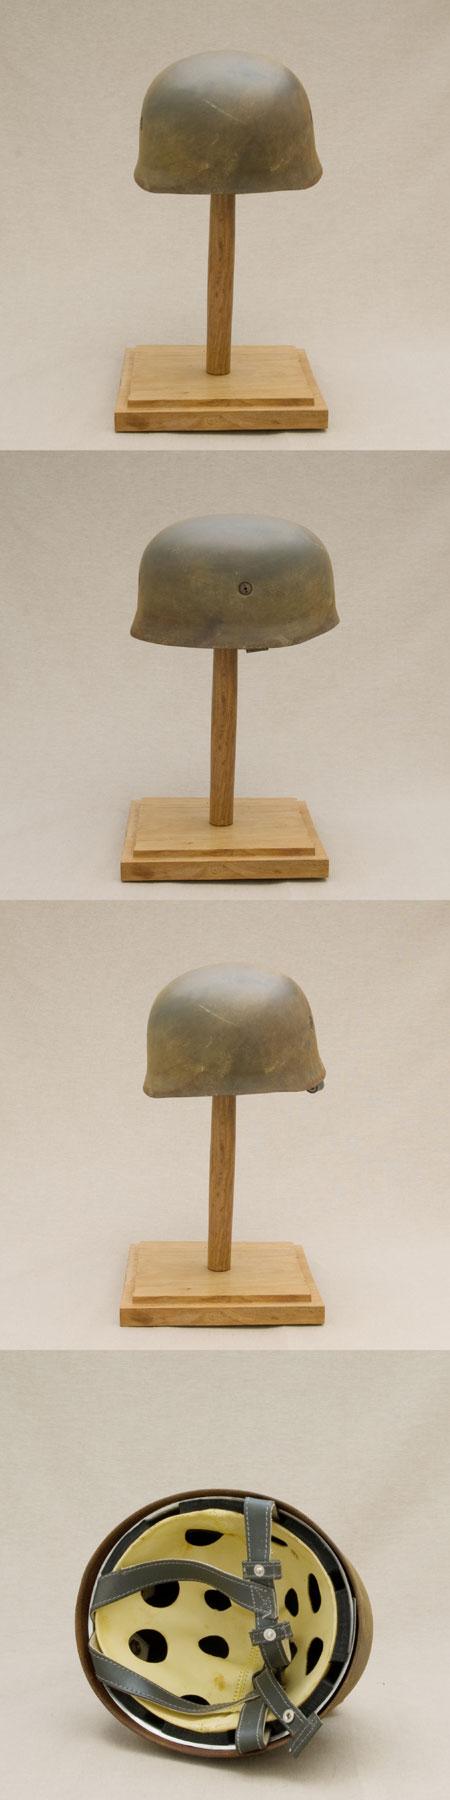 German Paratrooper helmet, WW 2, camouflage